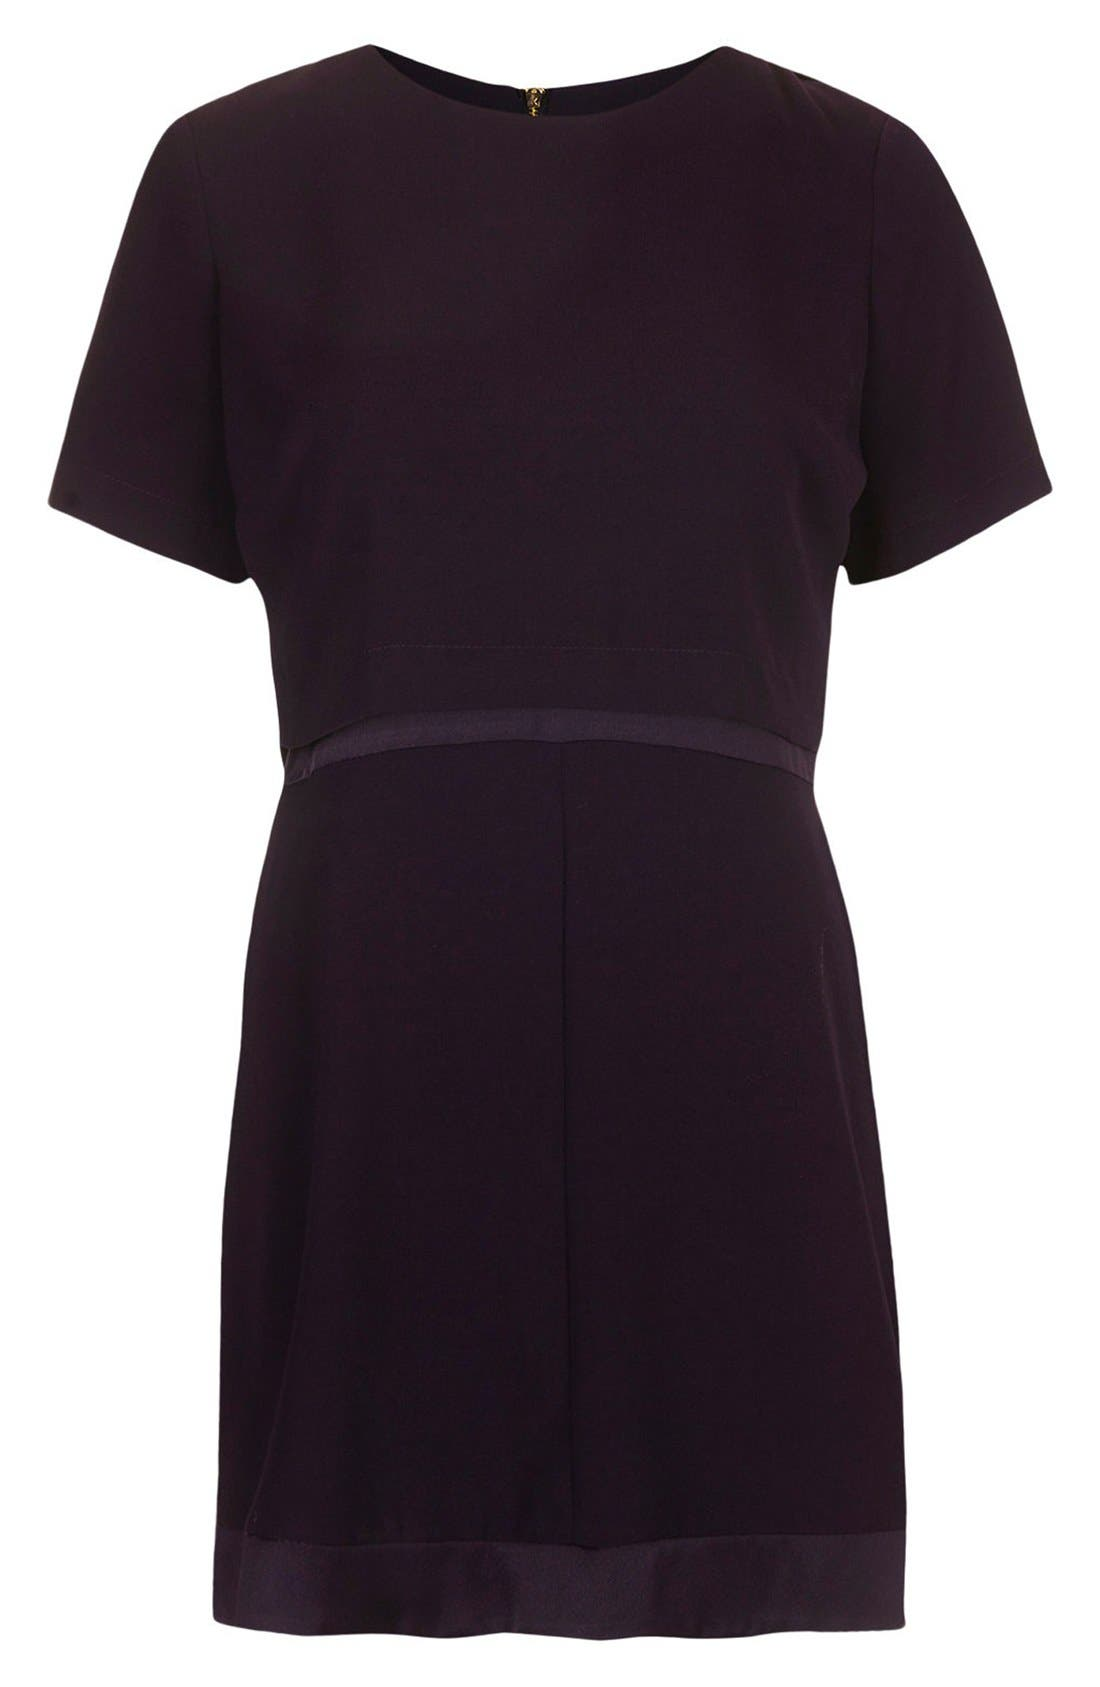 Alternate Image 3  - Topshop Satin Trim Overlay Dress